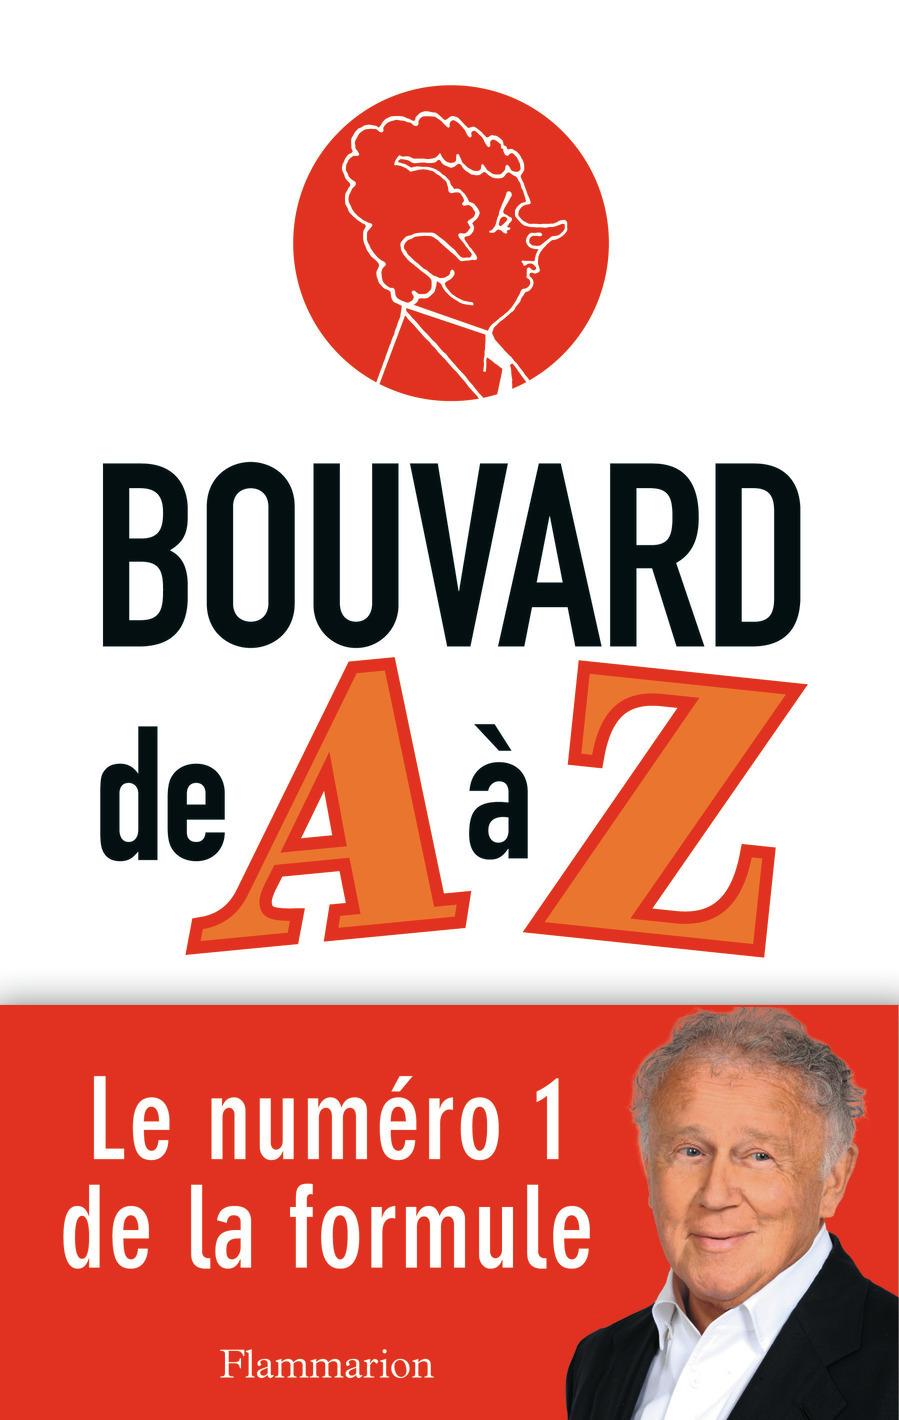 BOUVARD DE A A Z